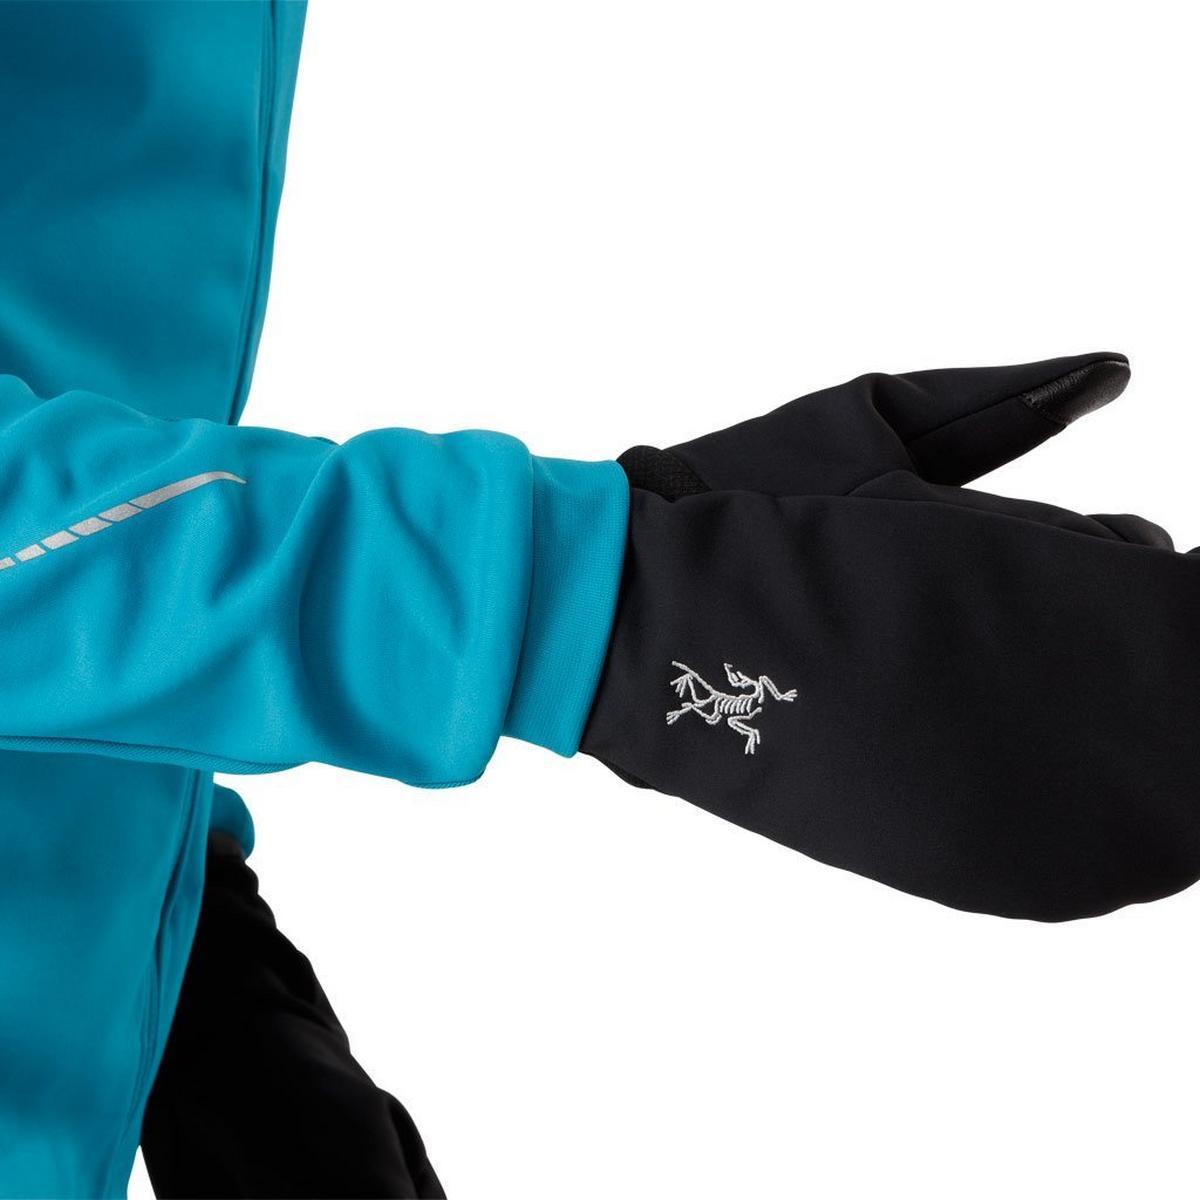 Arcteryx Unisex Arc'teryx Venta Mittens - Black